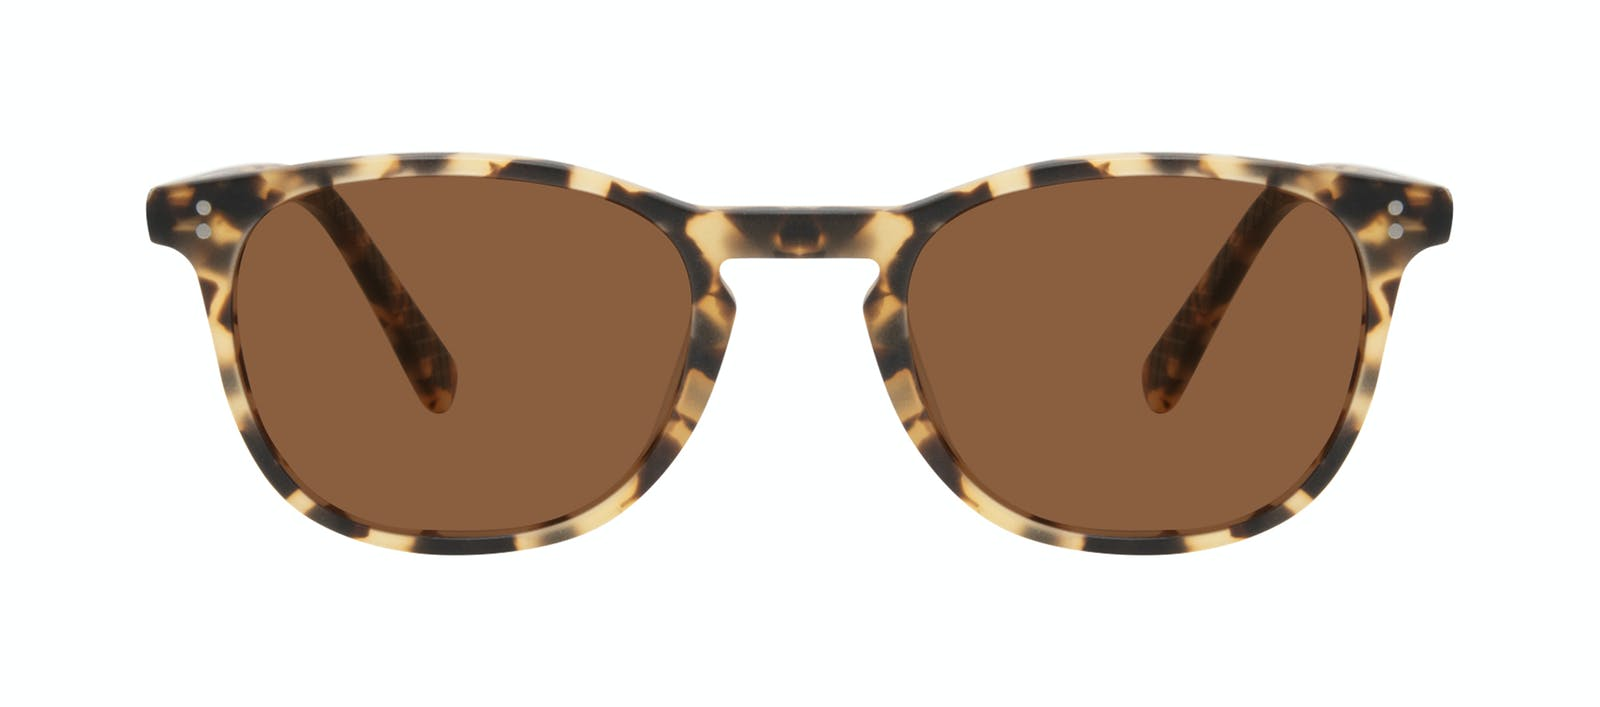 a7bab1e256 Affordable Fashion Glasses Round Sunglasses Men Trooper Tortoise Matte Front